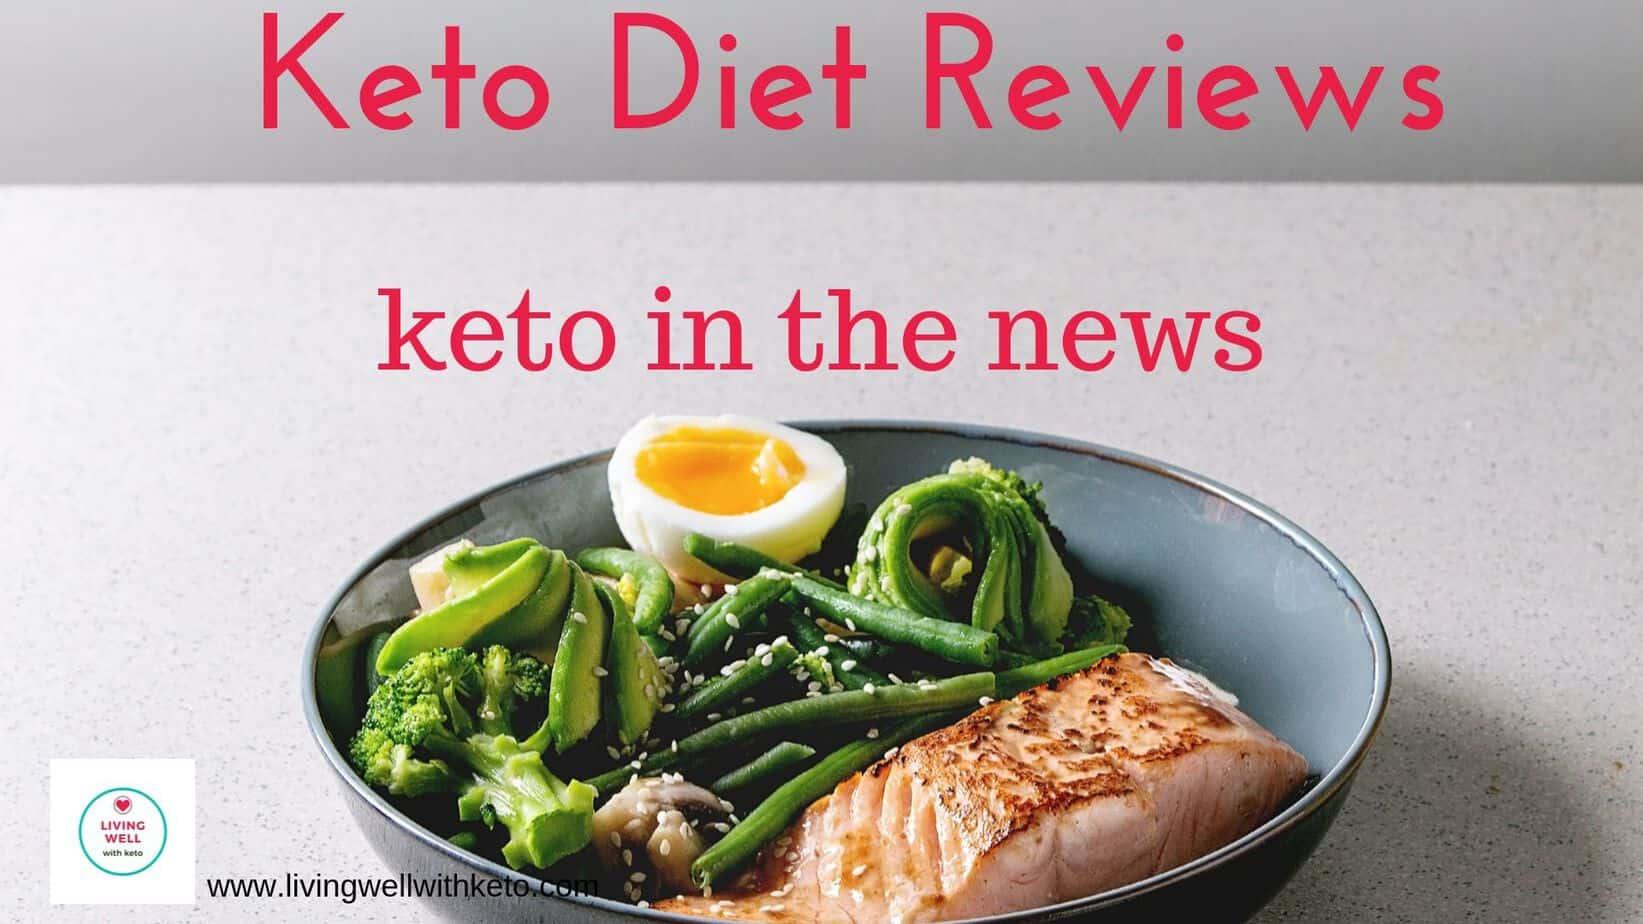 https://livingwellwithketo.com/keto-diet-reviews-keto-in-the-news/